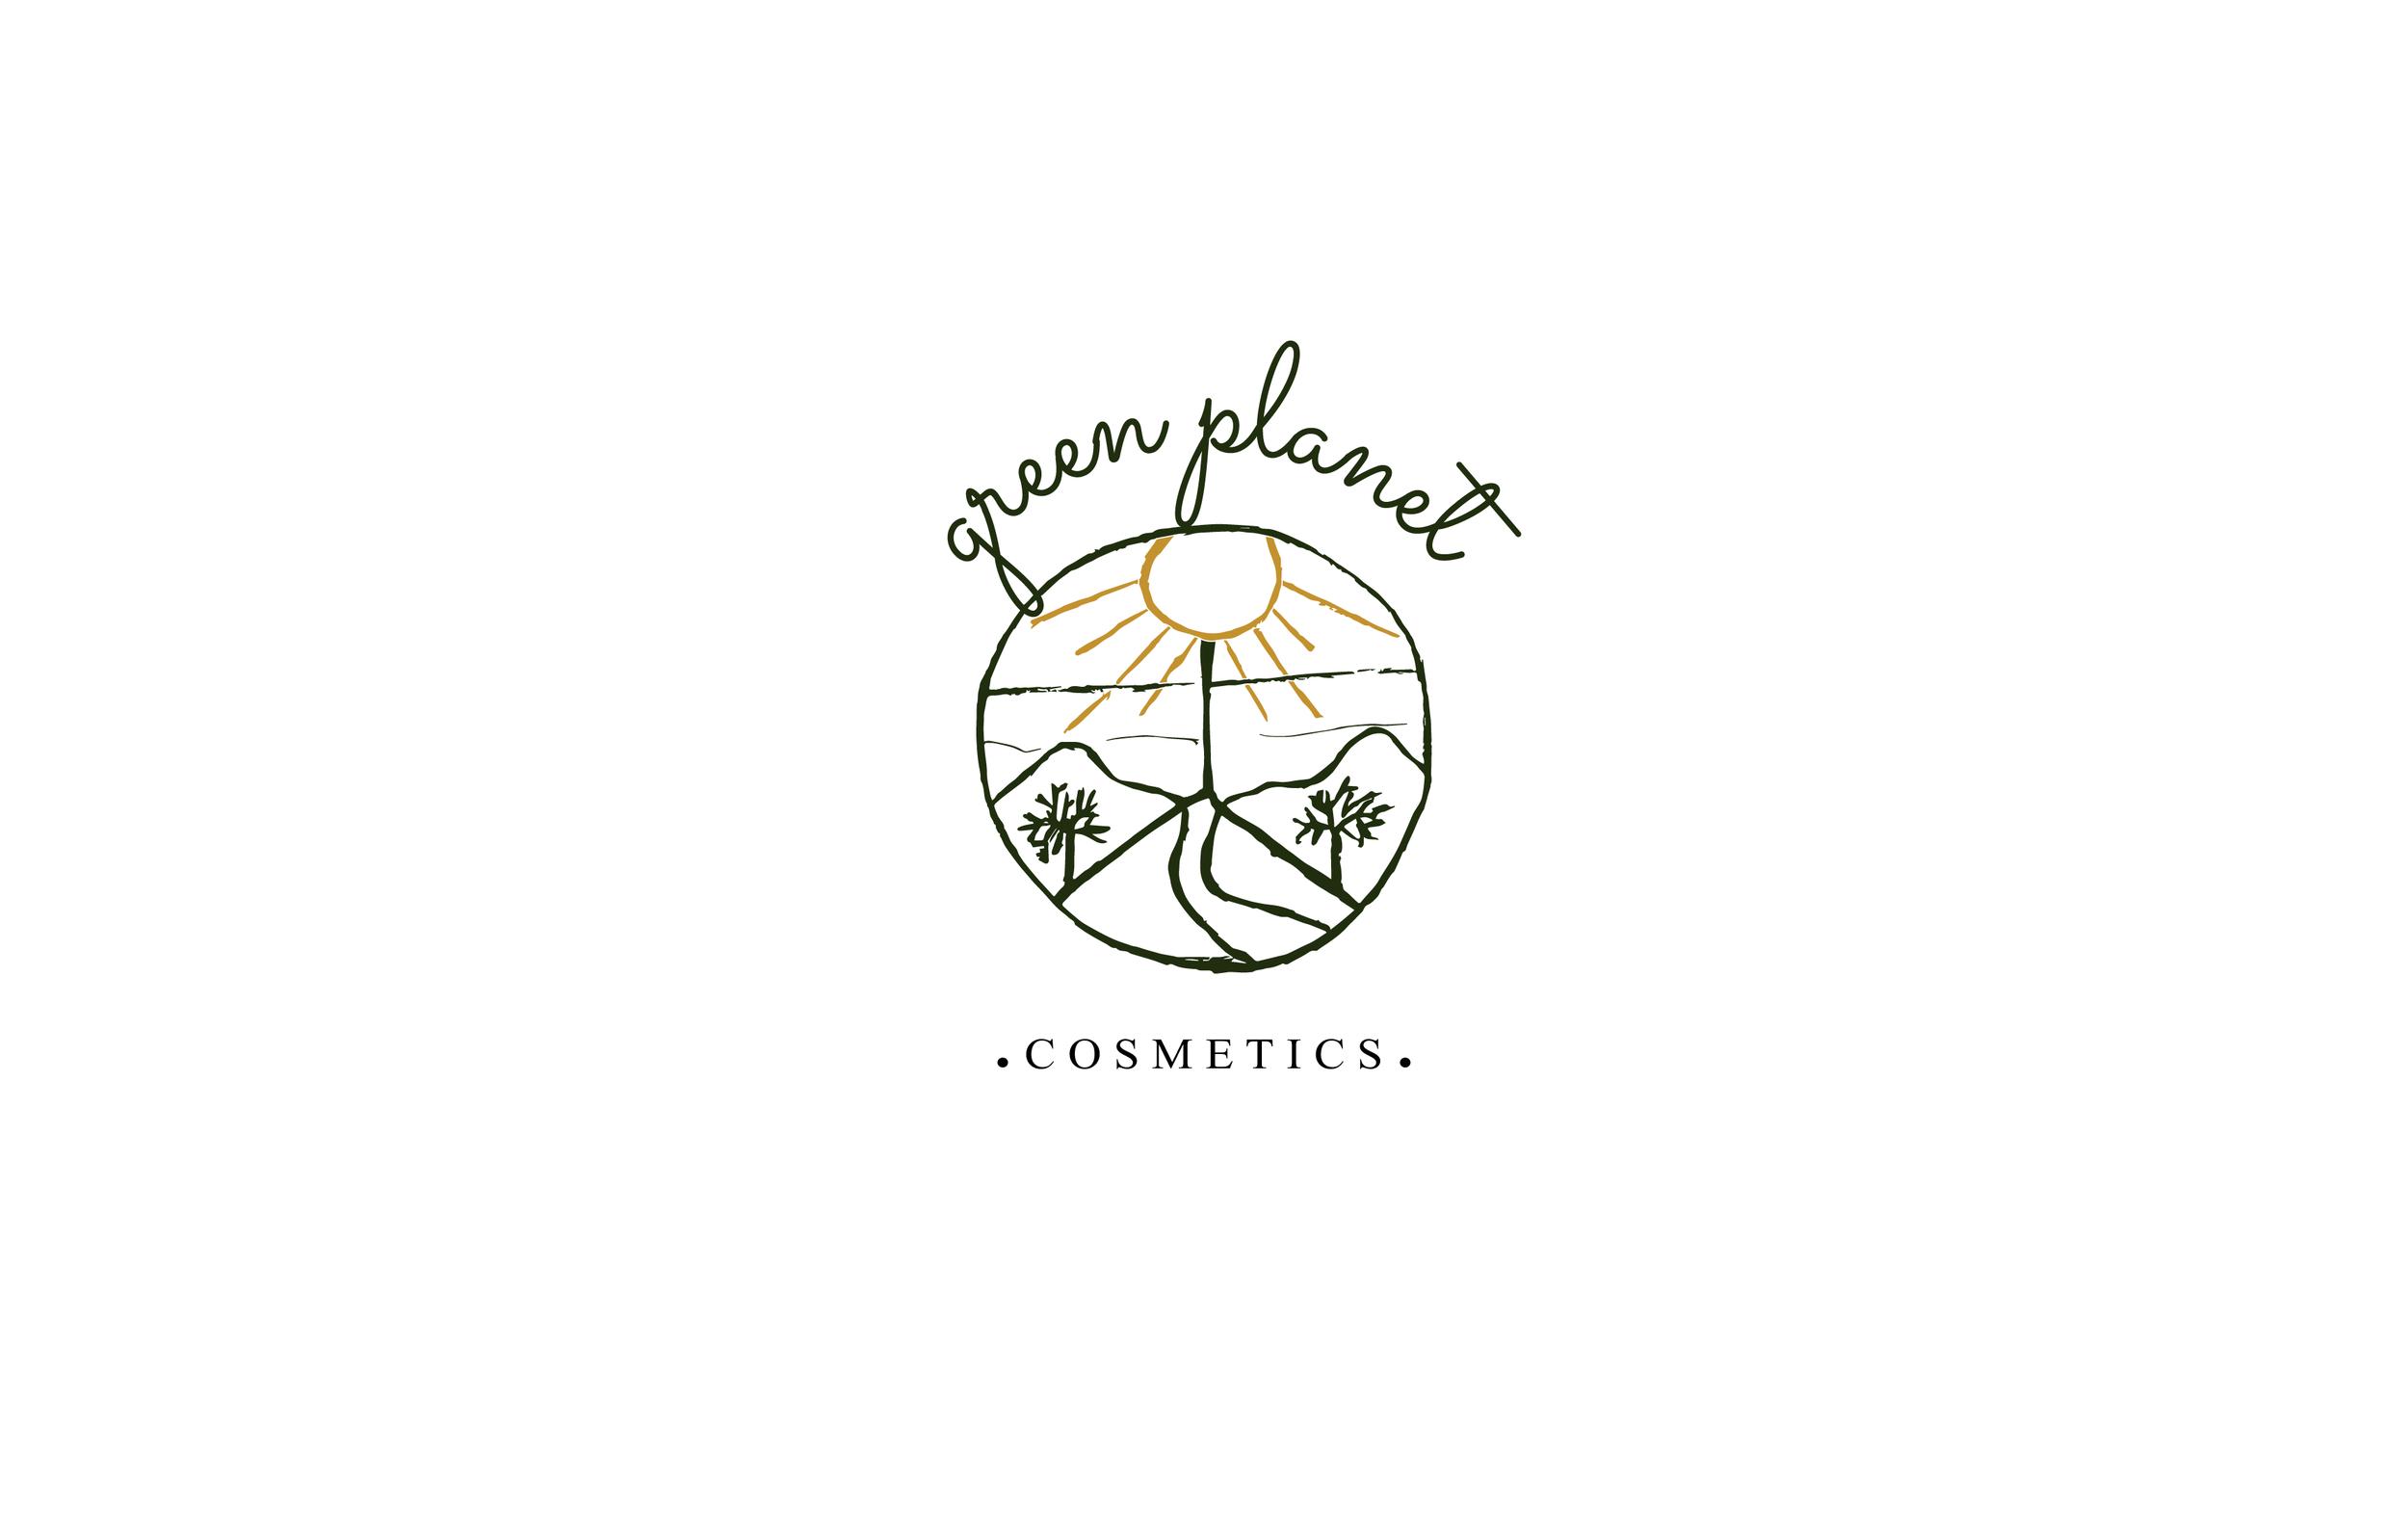 Green planet cosmetics logo design.png